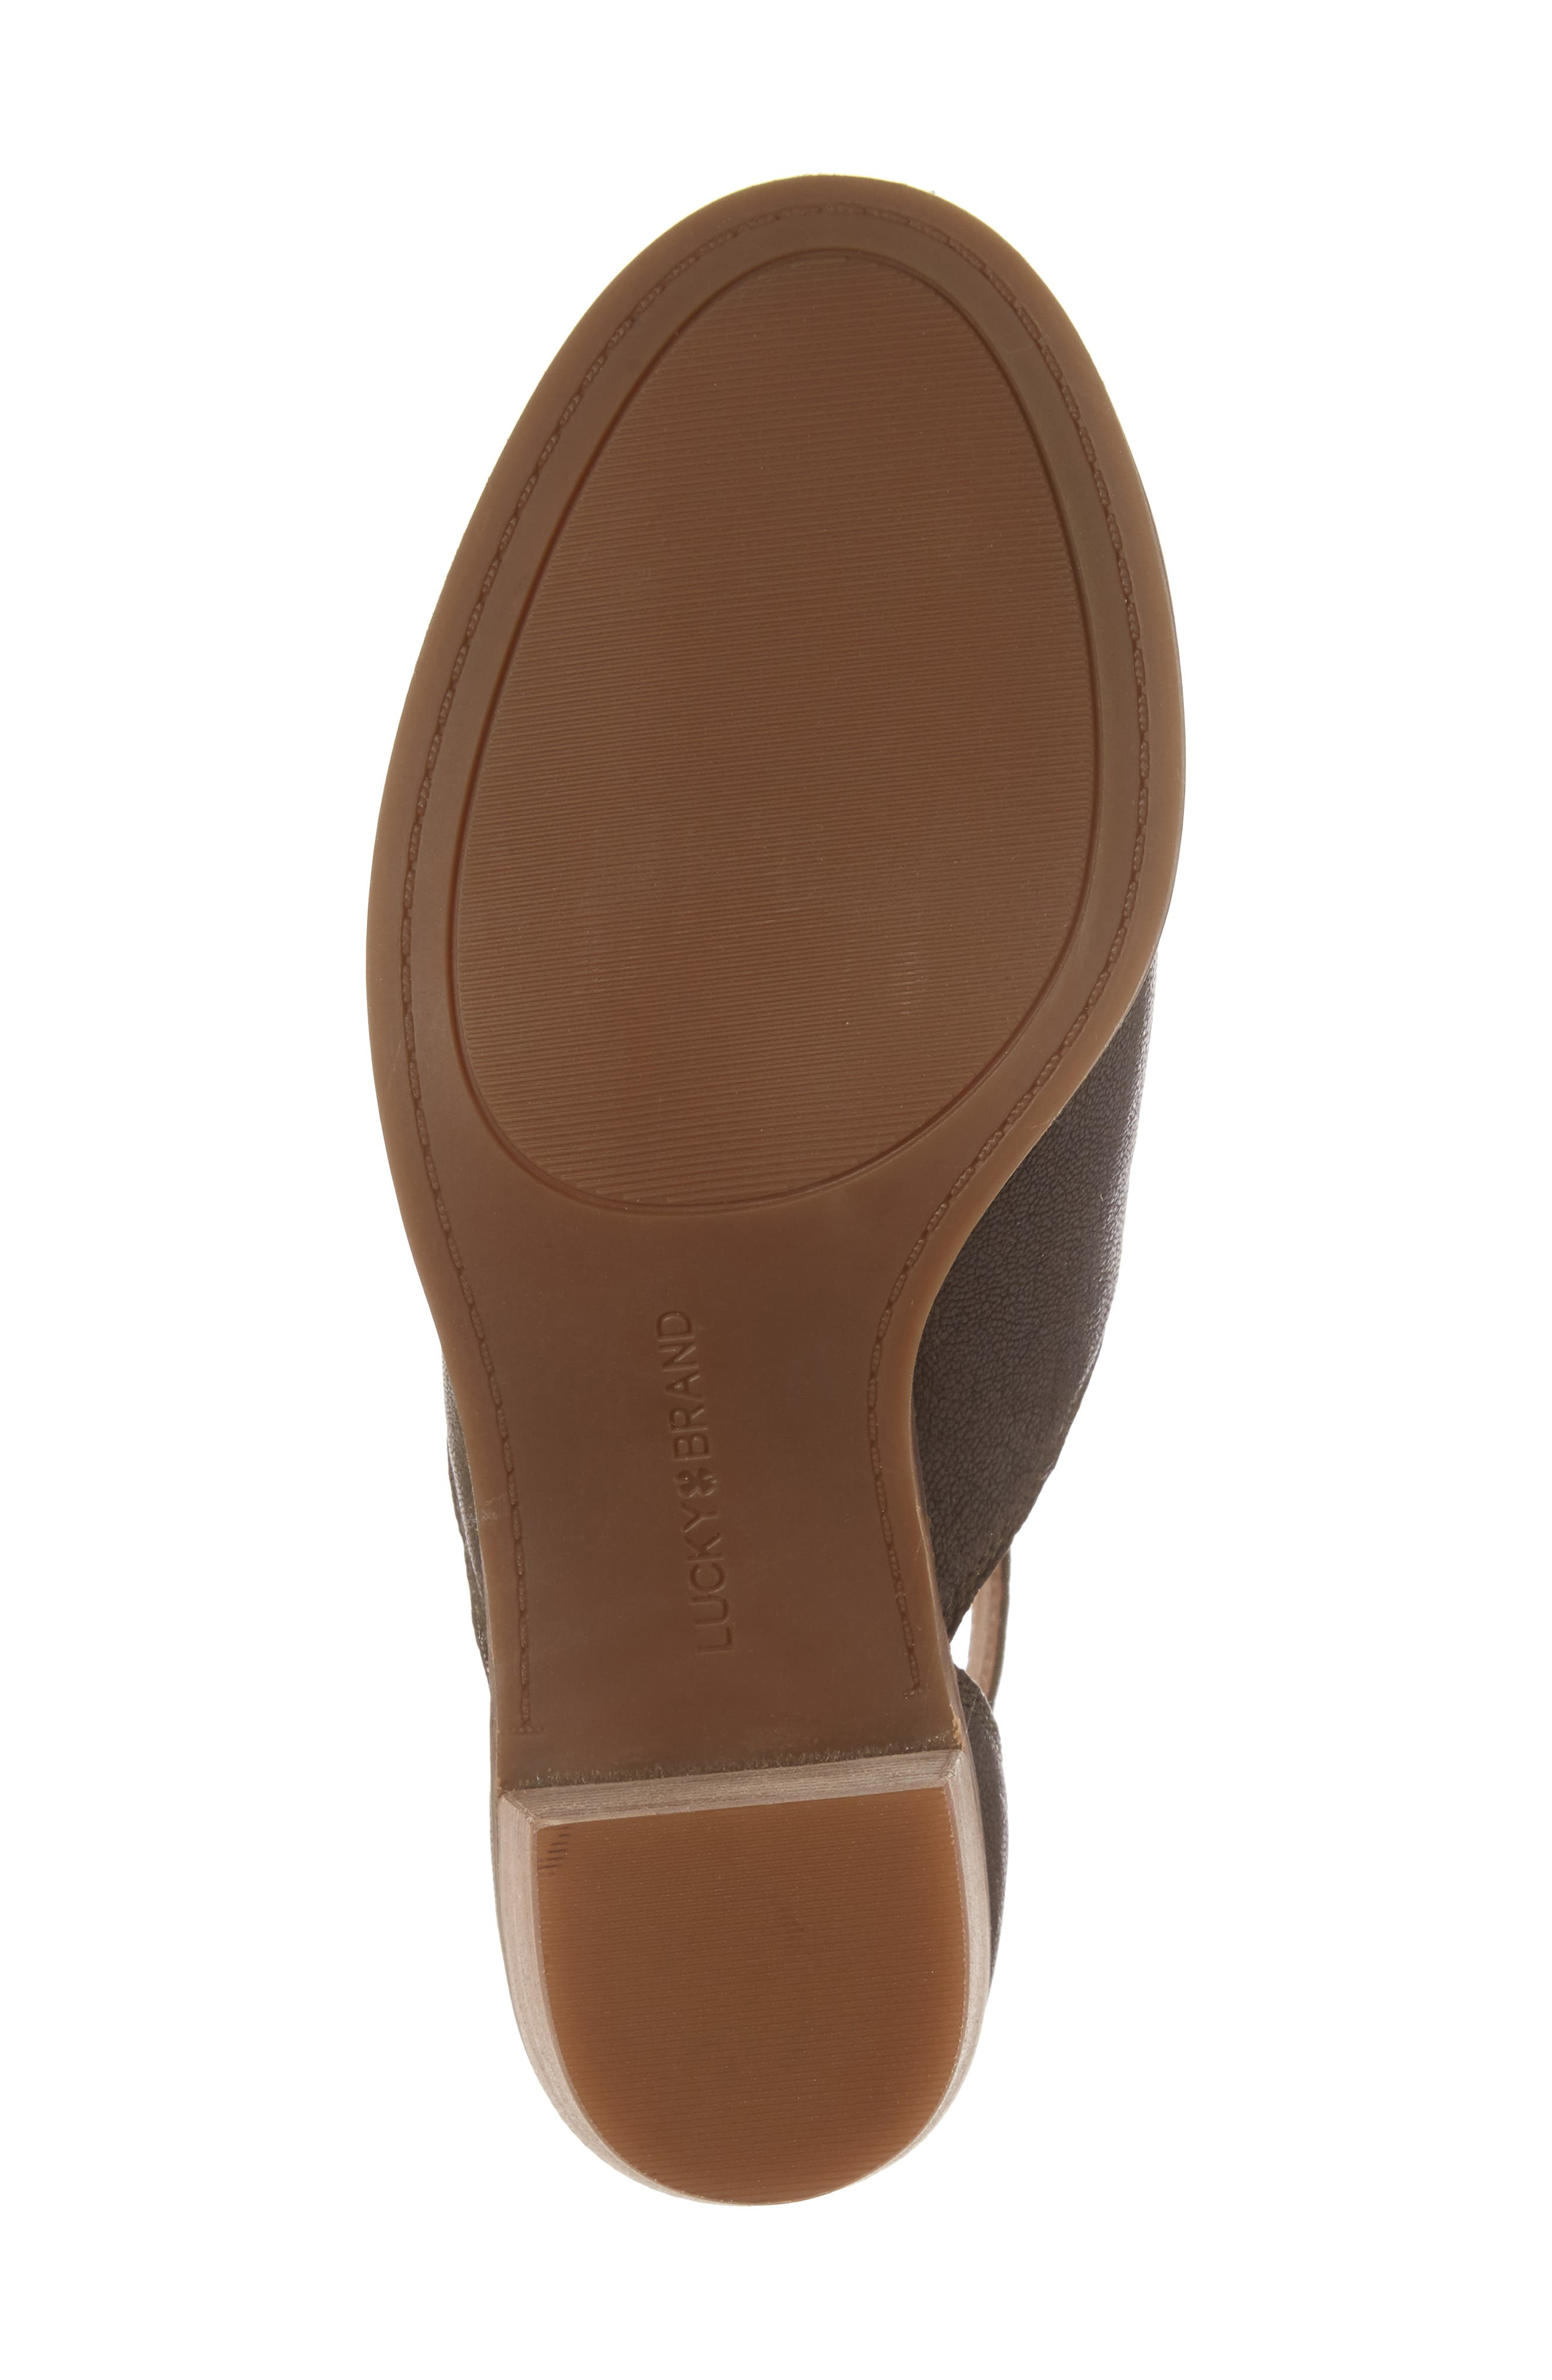 Kadian Block Heel Sandal,                             Alternate thumbnail 12, color,